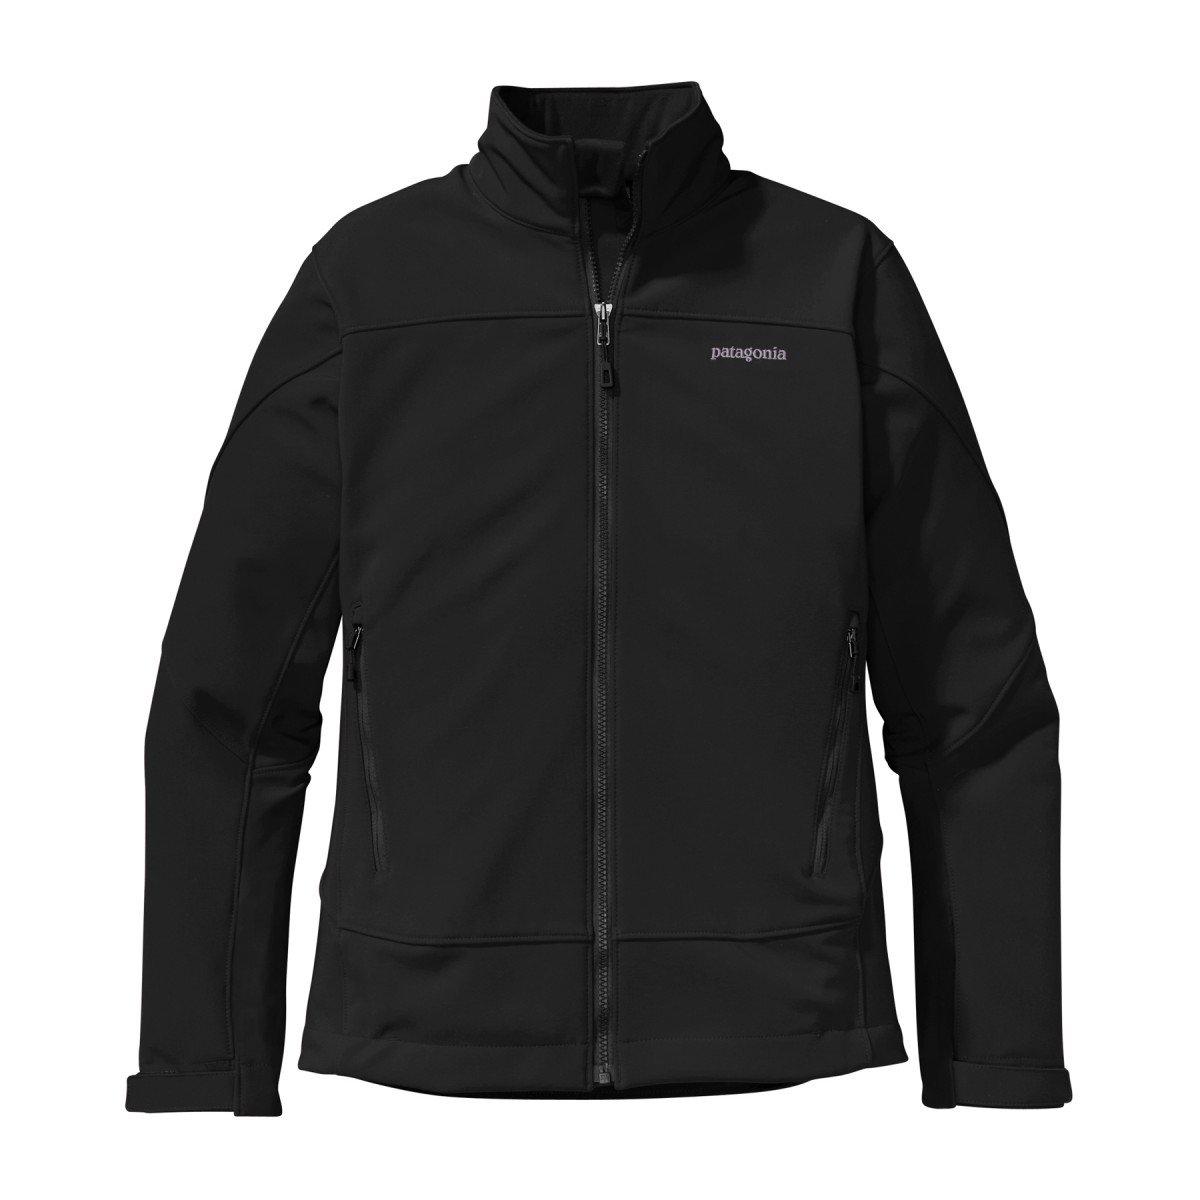 patagonia damen jacke adze jacket g nstig kaufen. Black Bedroom Furniture Sets. Home Design Ideas